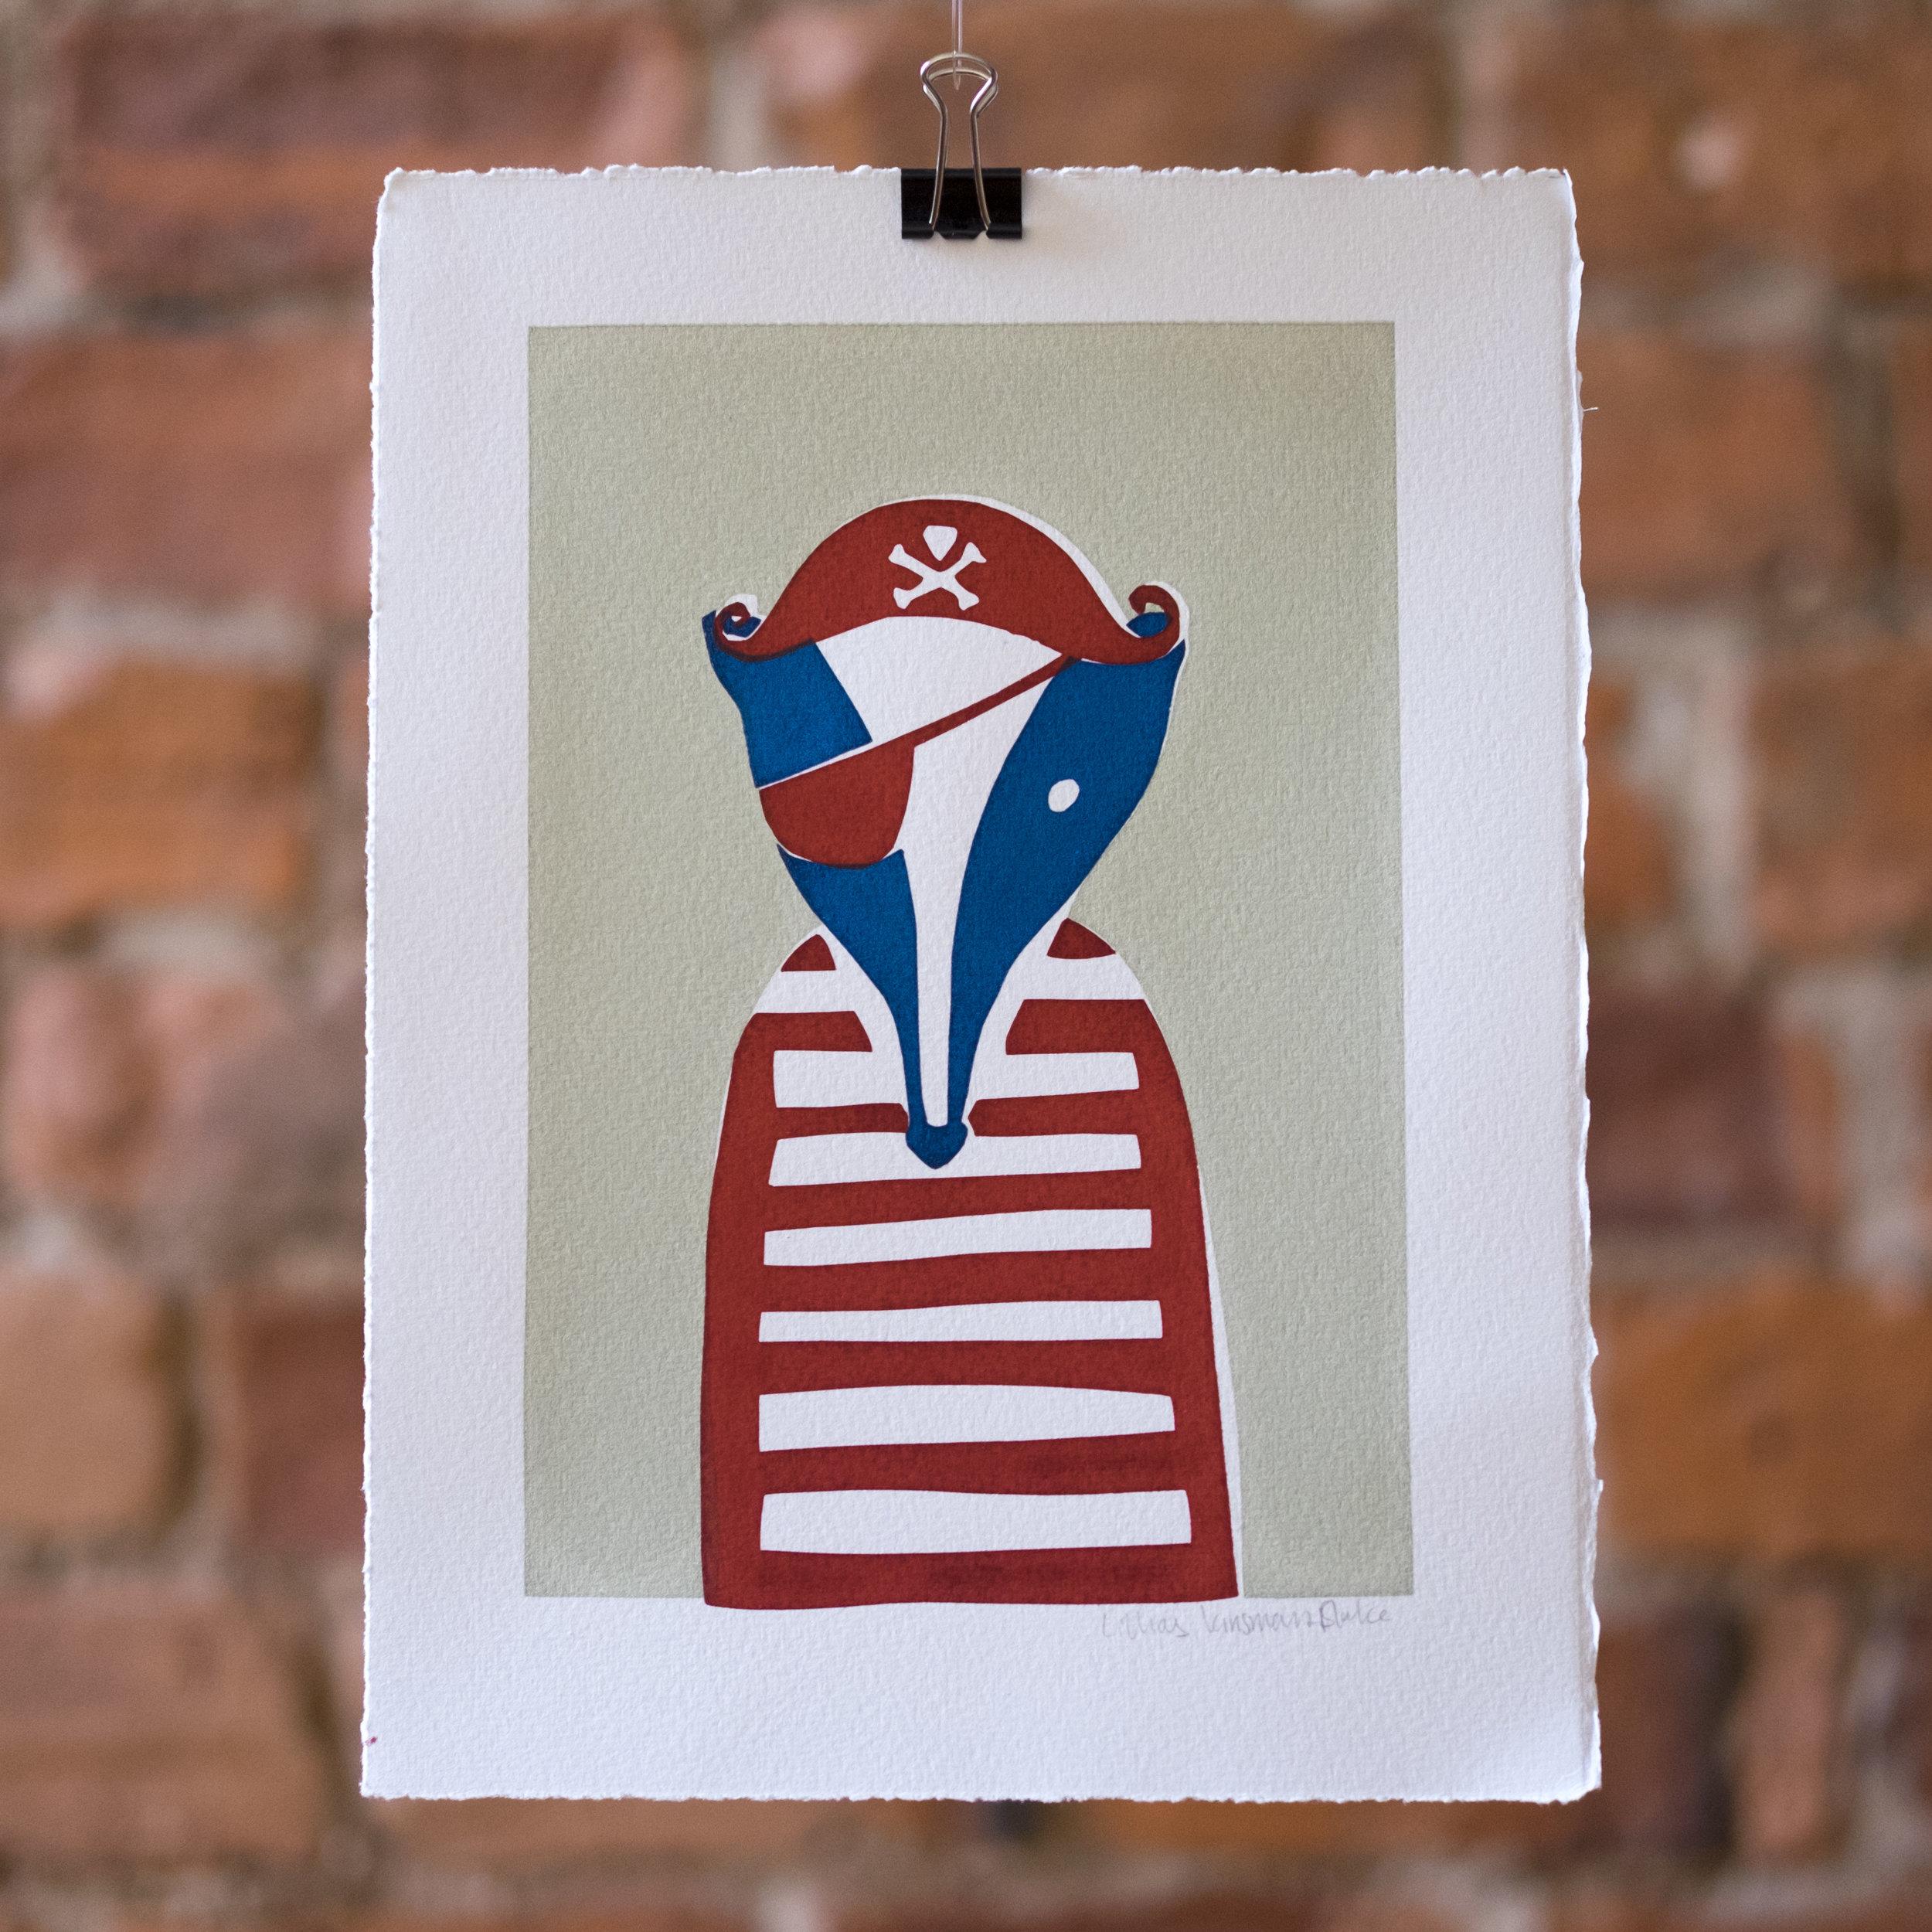 Jolly Badger. Pirate Badger mugshot. Screen Print.